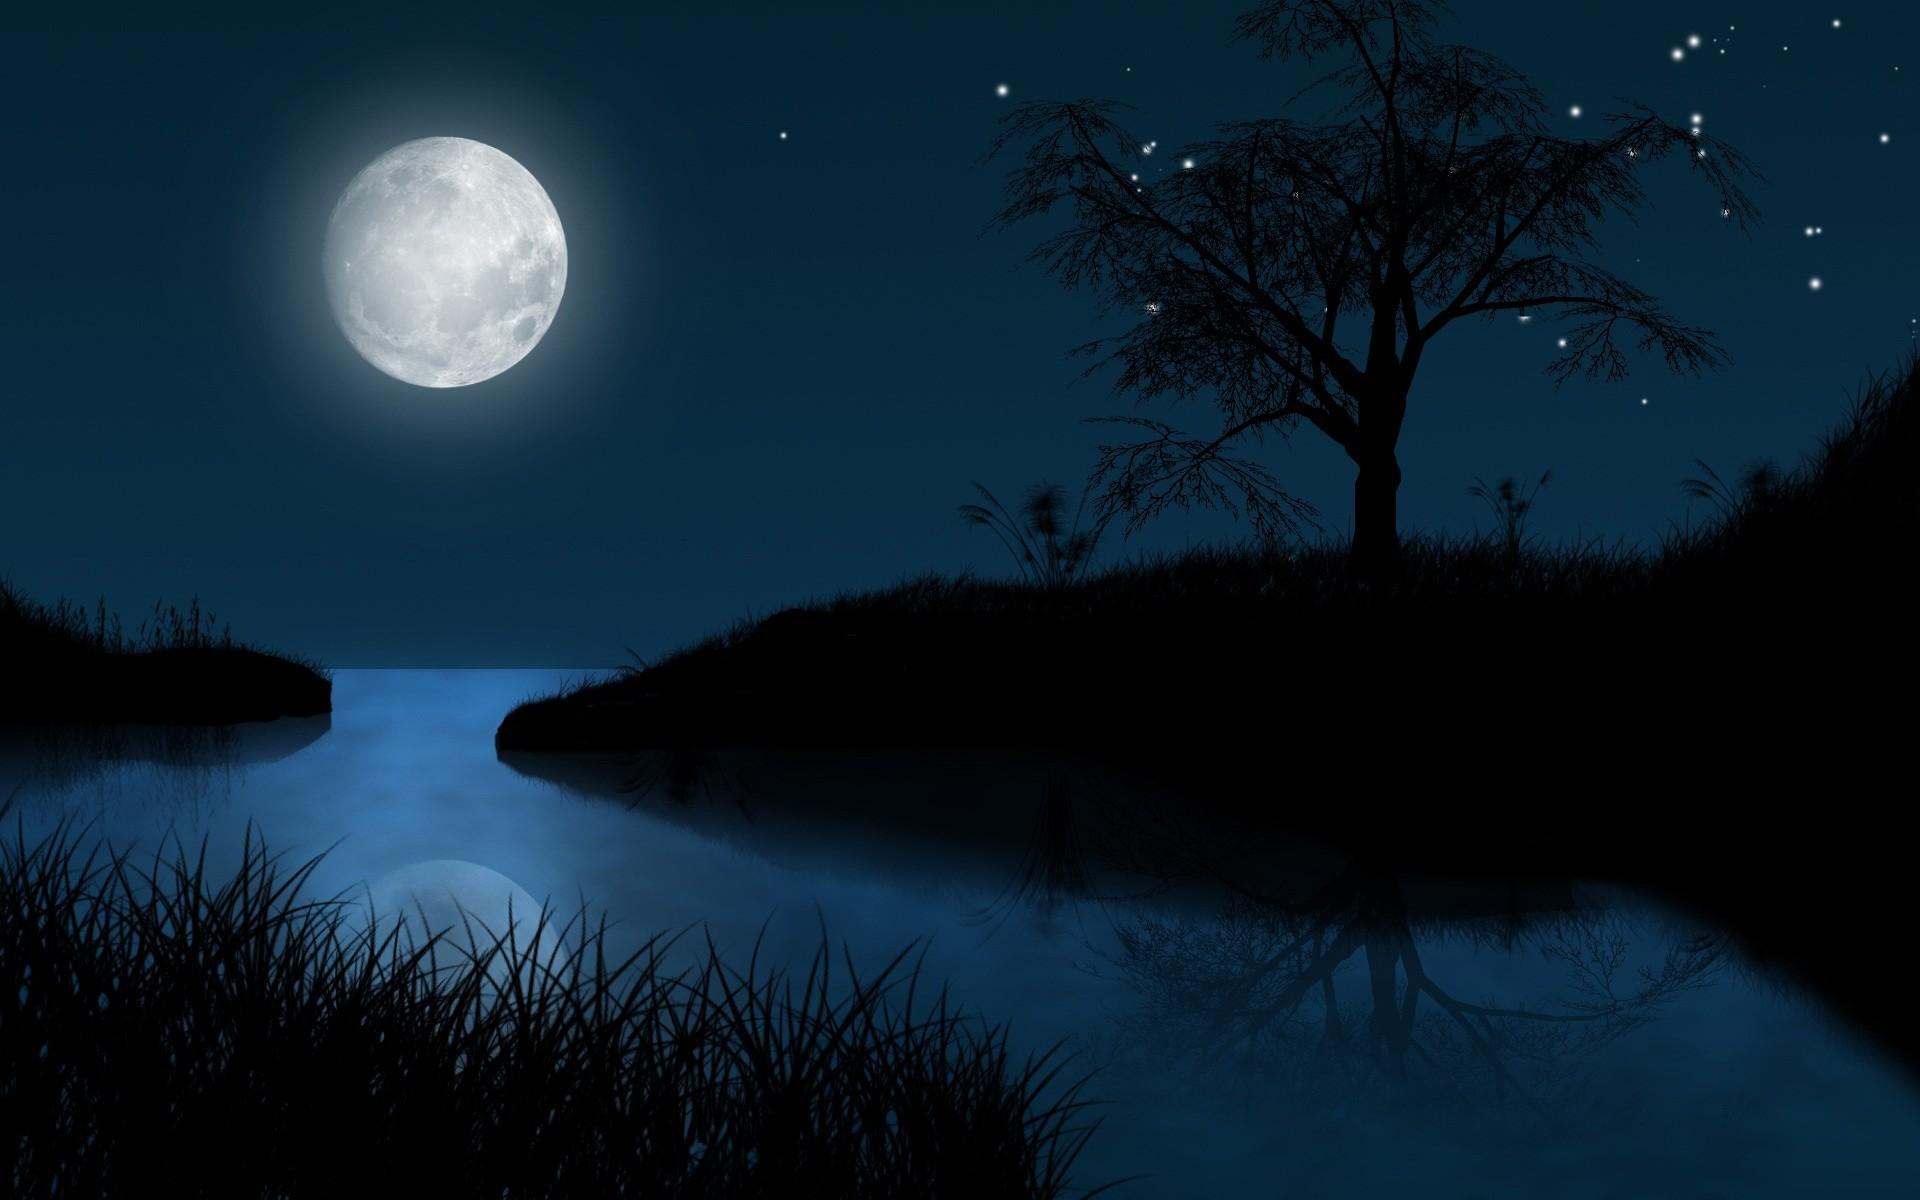 Moon Wallpaper Hd 82 Images